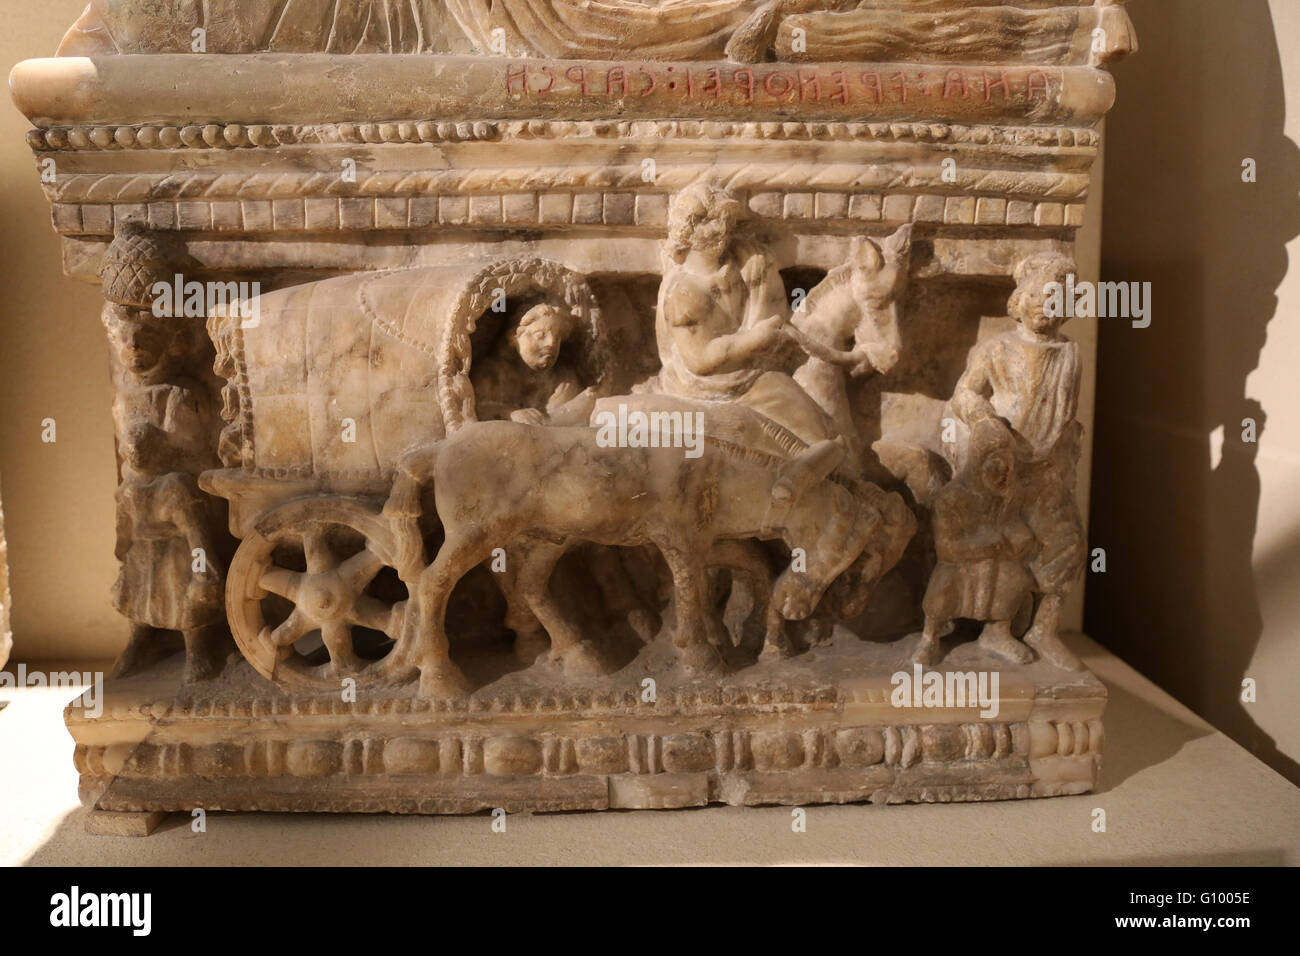 Etruria. Funerary urn. Voyage in capentum (carriage). 1st-2nd century BC. Volterra, Italy. Louvre Museum. Paris. - Stock Image